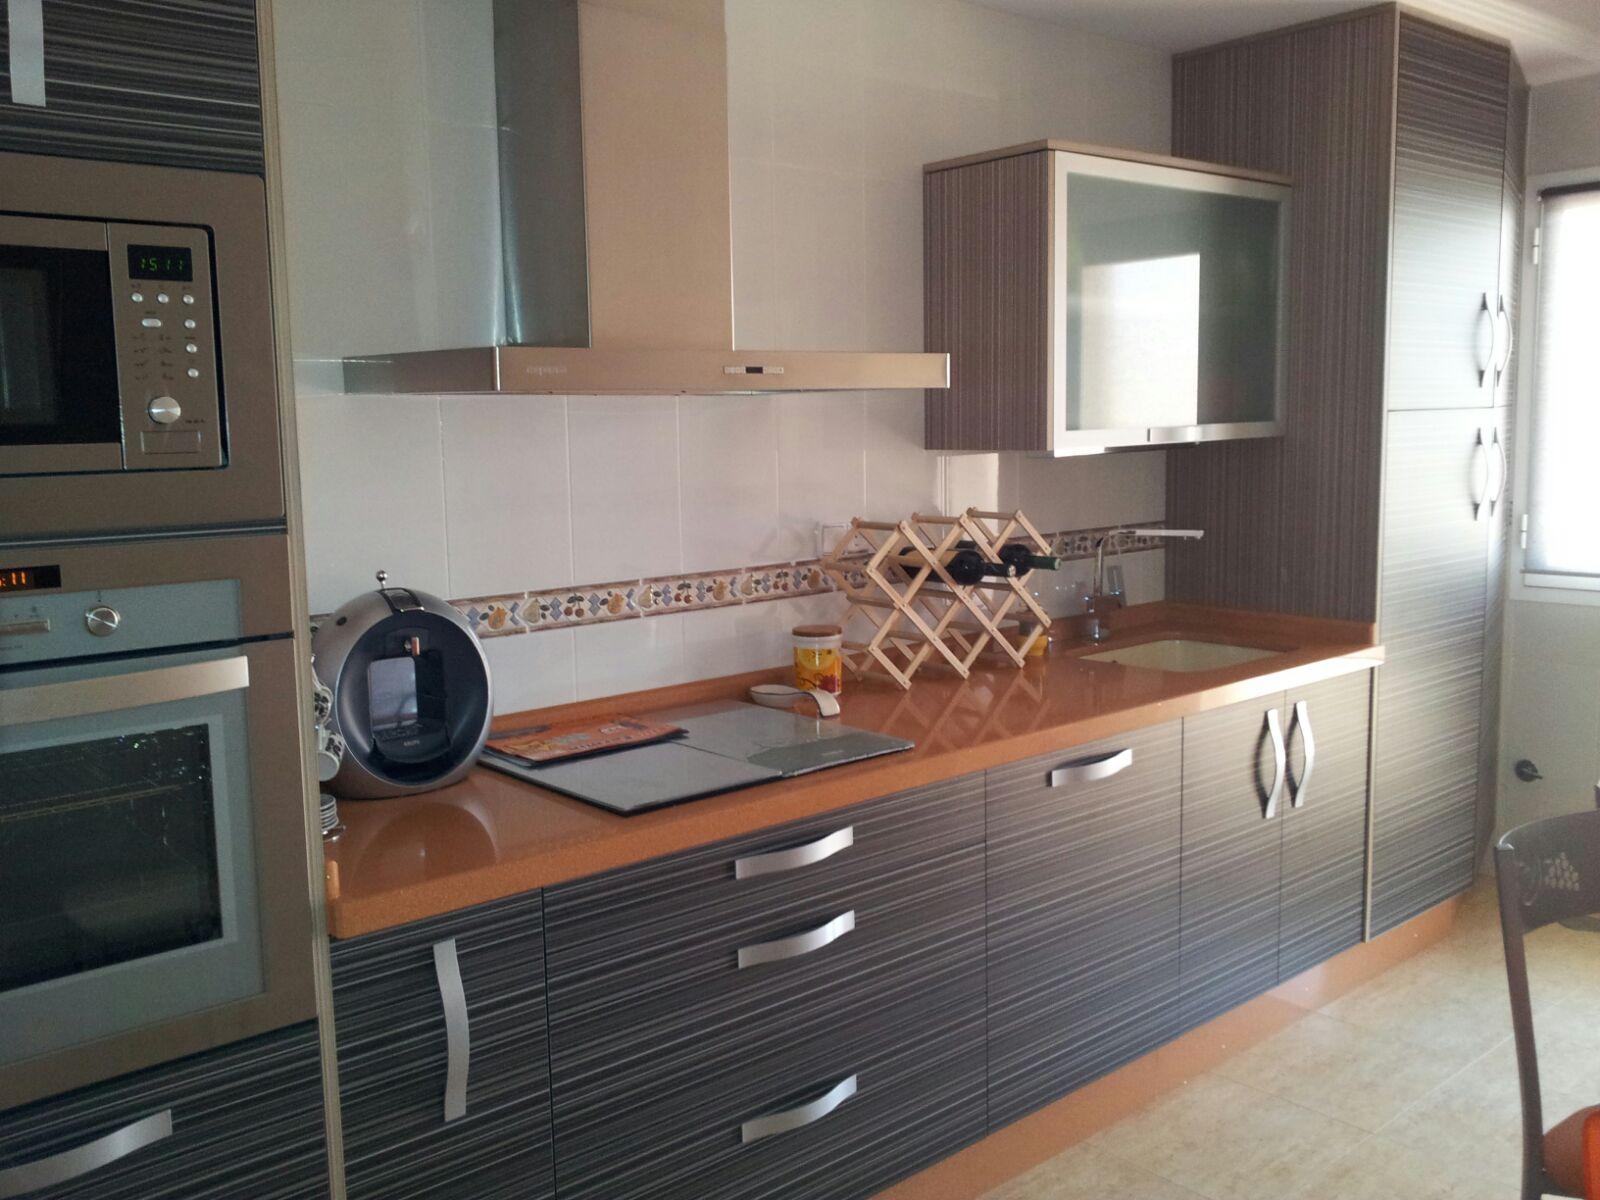 Muebles cocina gris oscuro ideas for Muebles de cocina gris